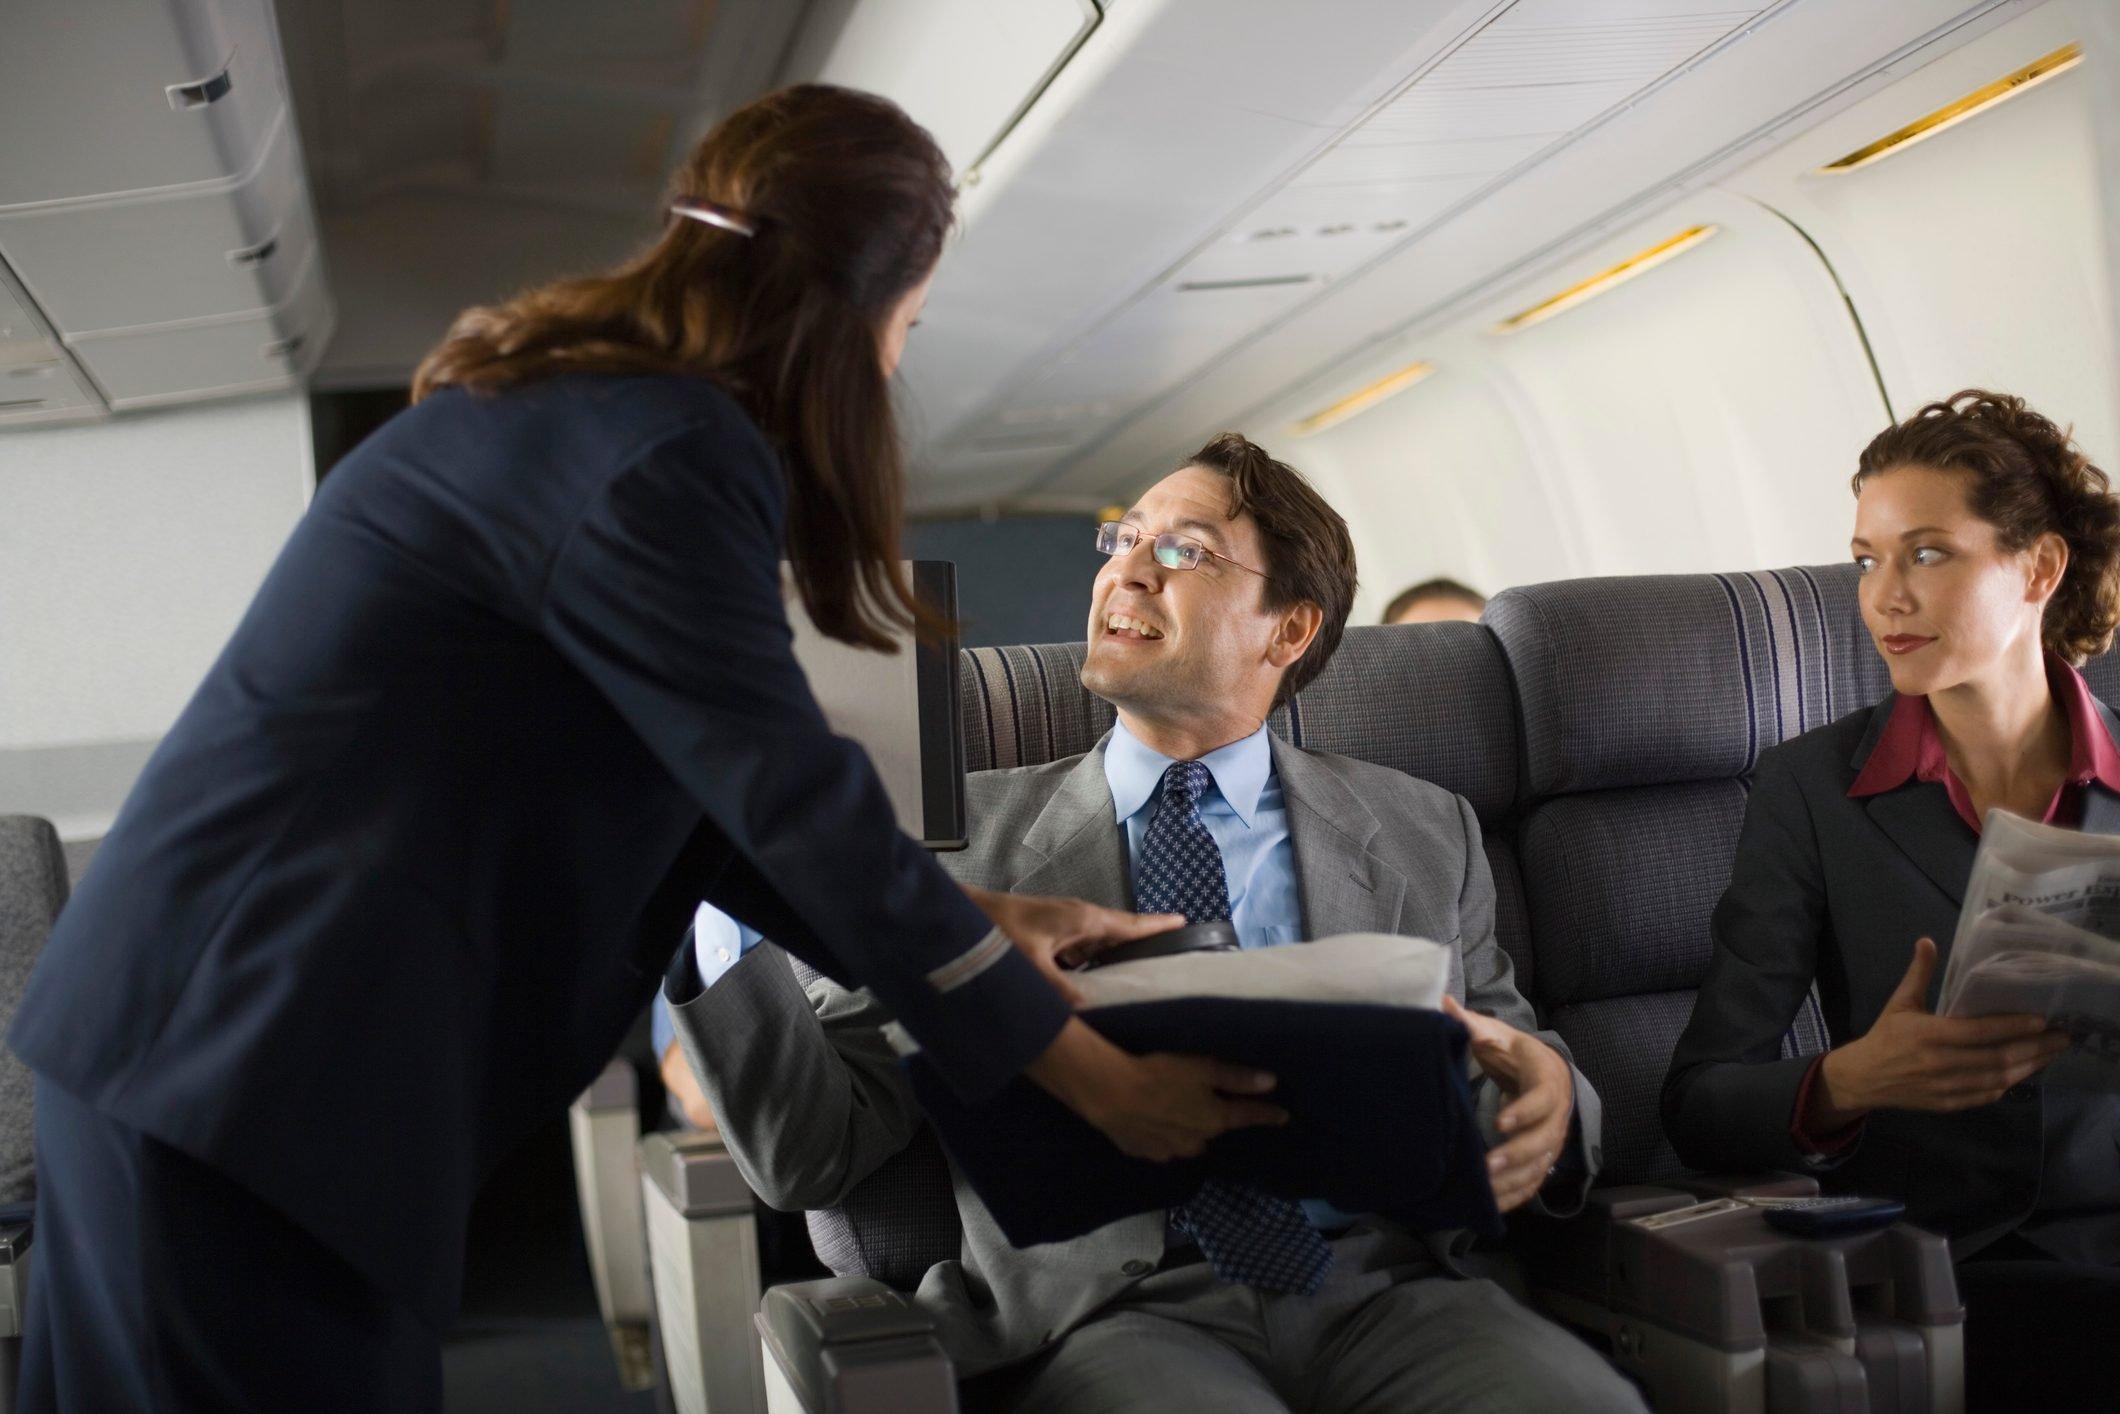 Stewardess handing blanket and pillow to passenger